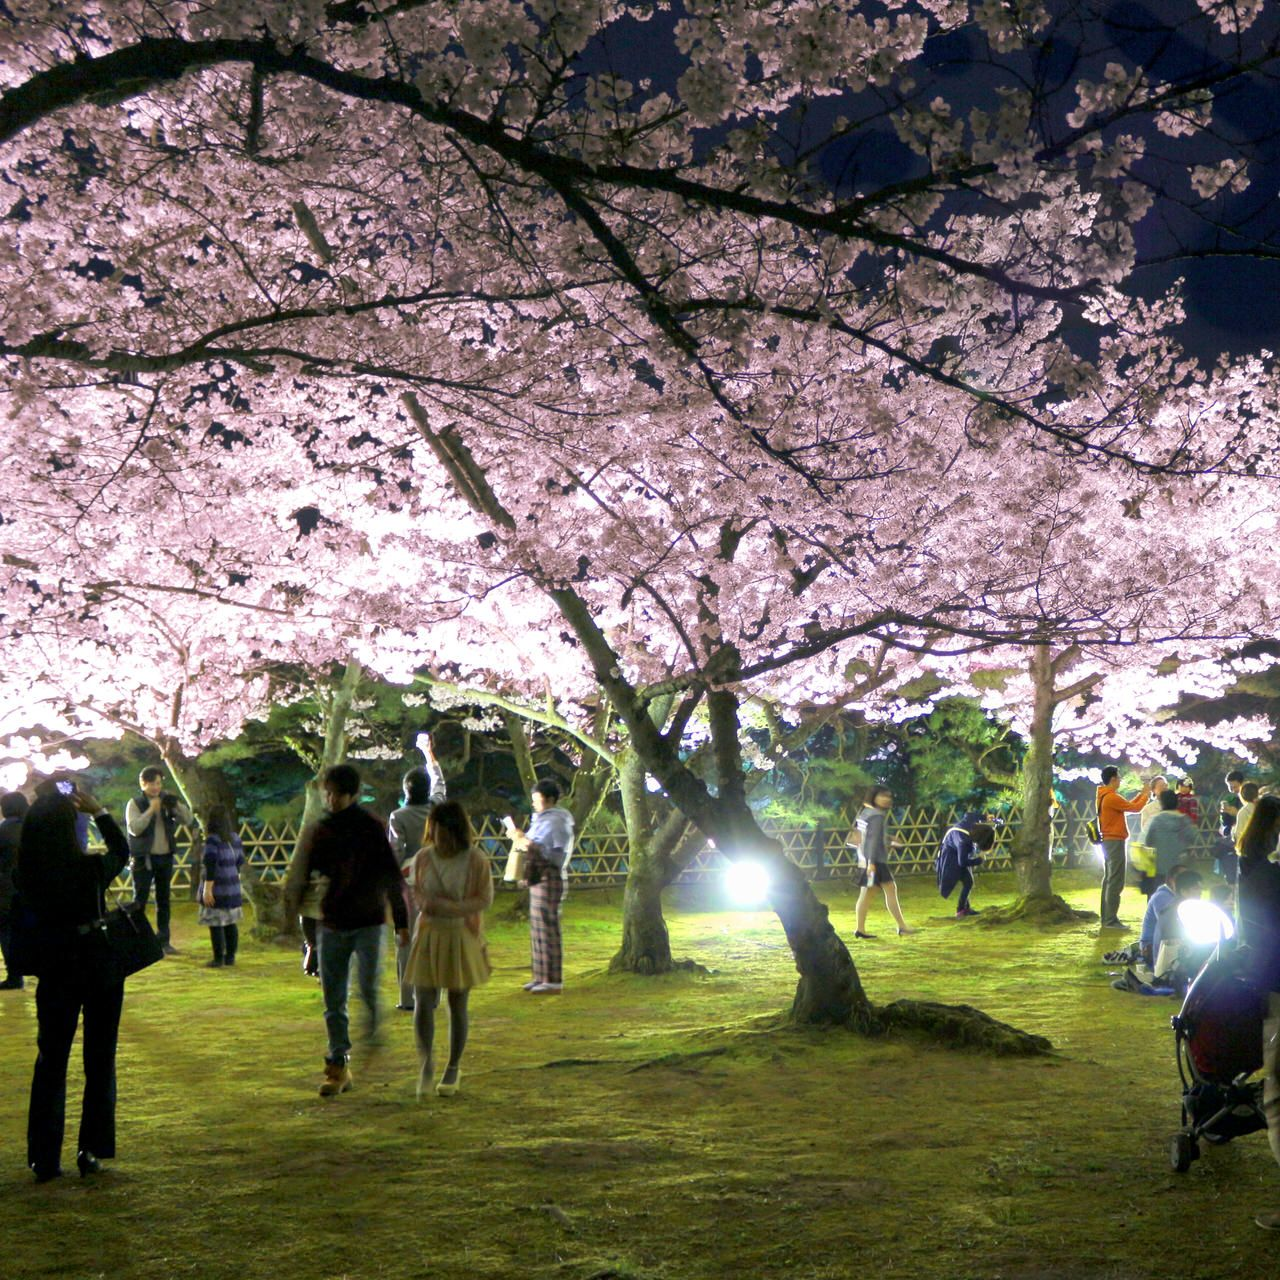 香川の定番観光地「栗林公園」の夜桜